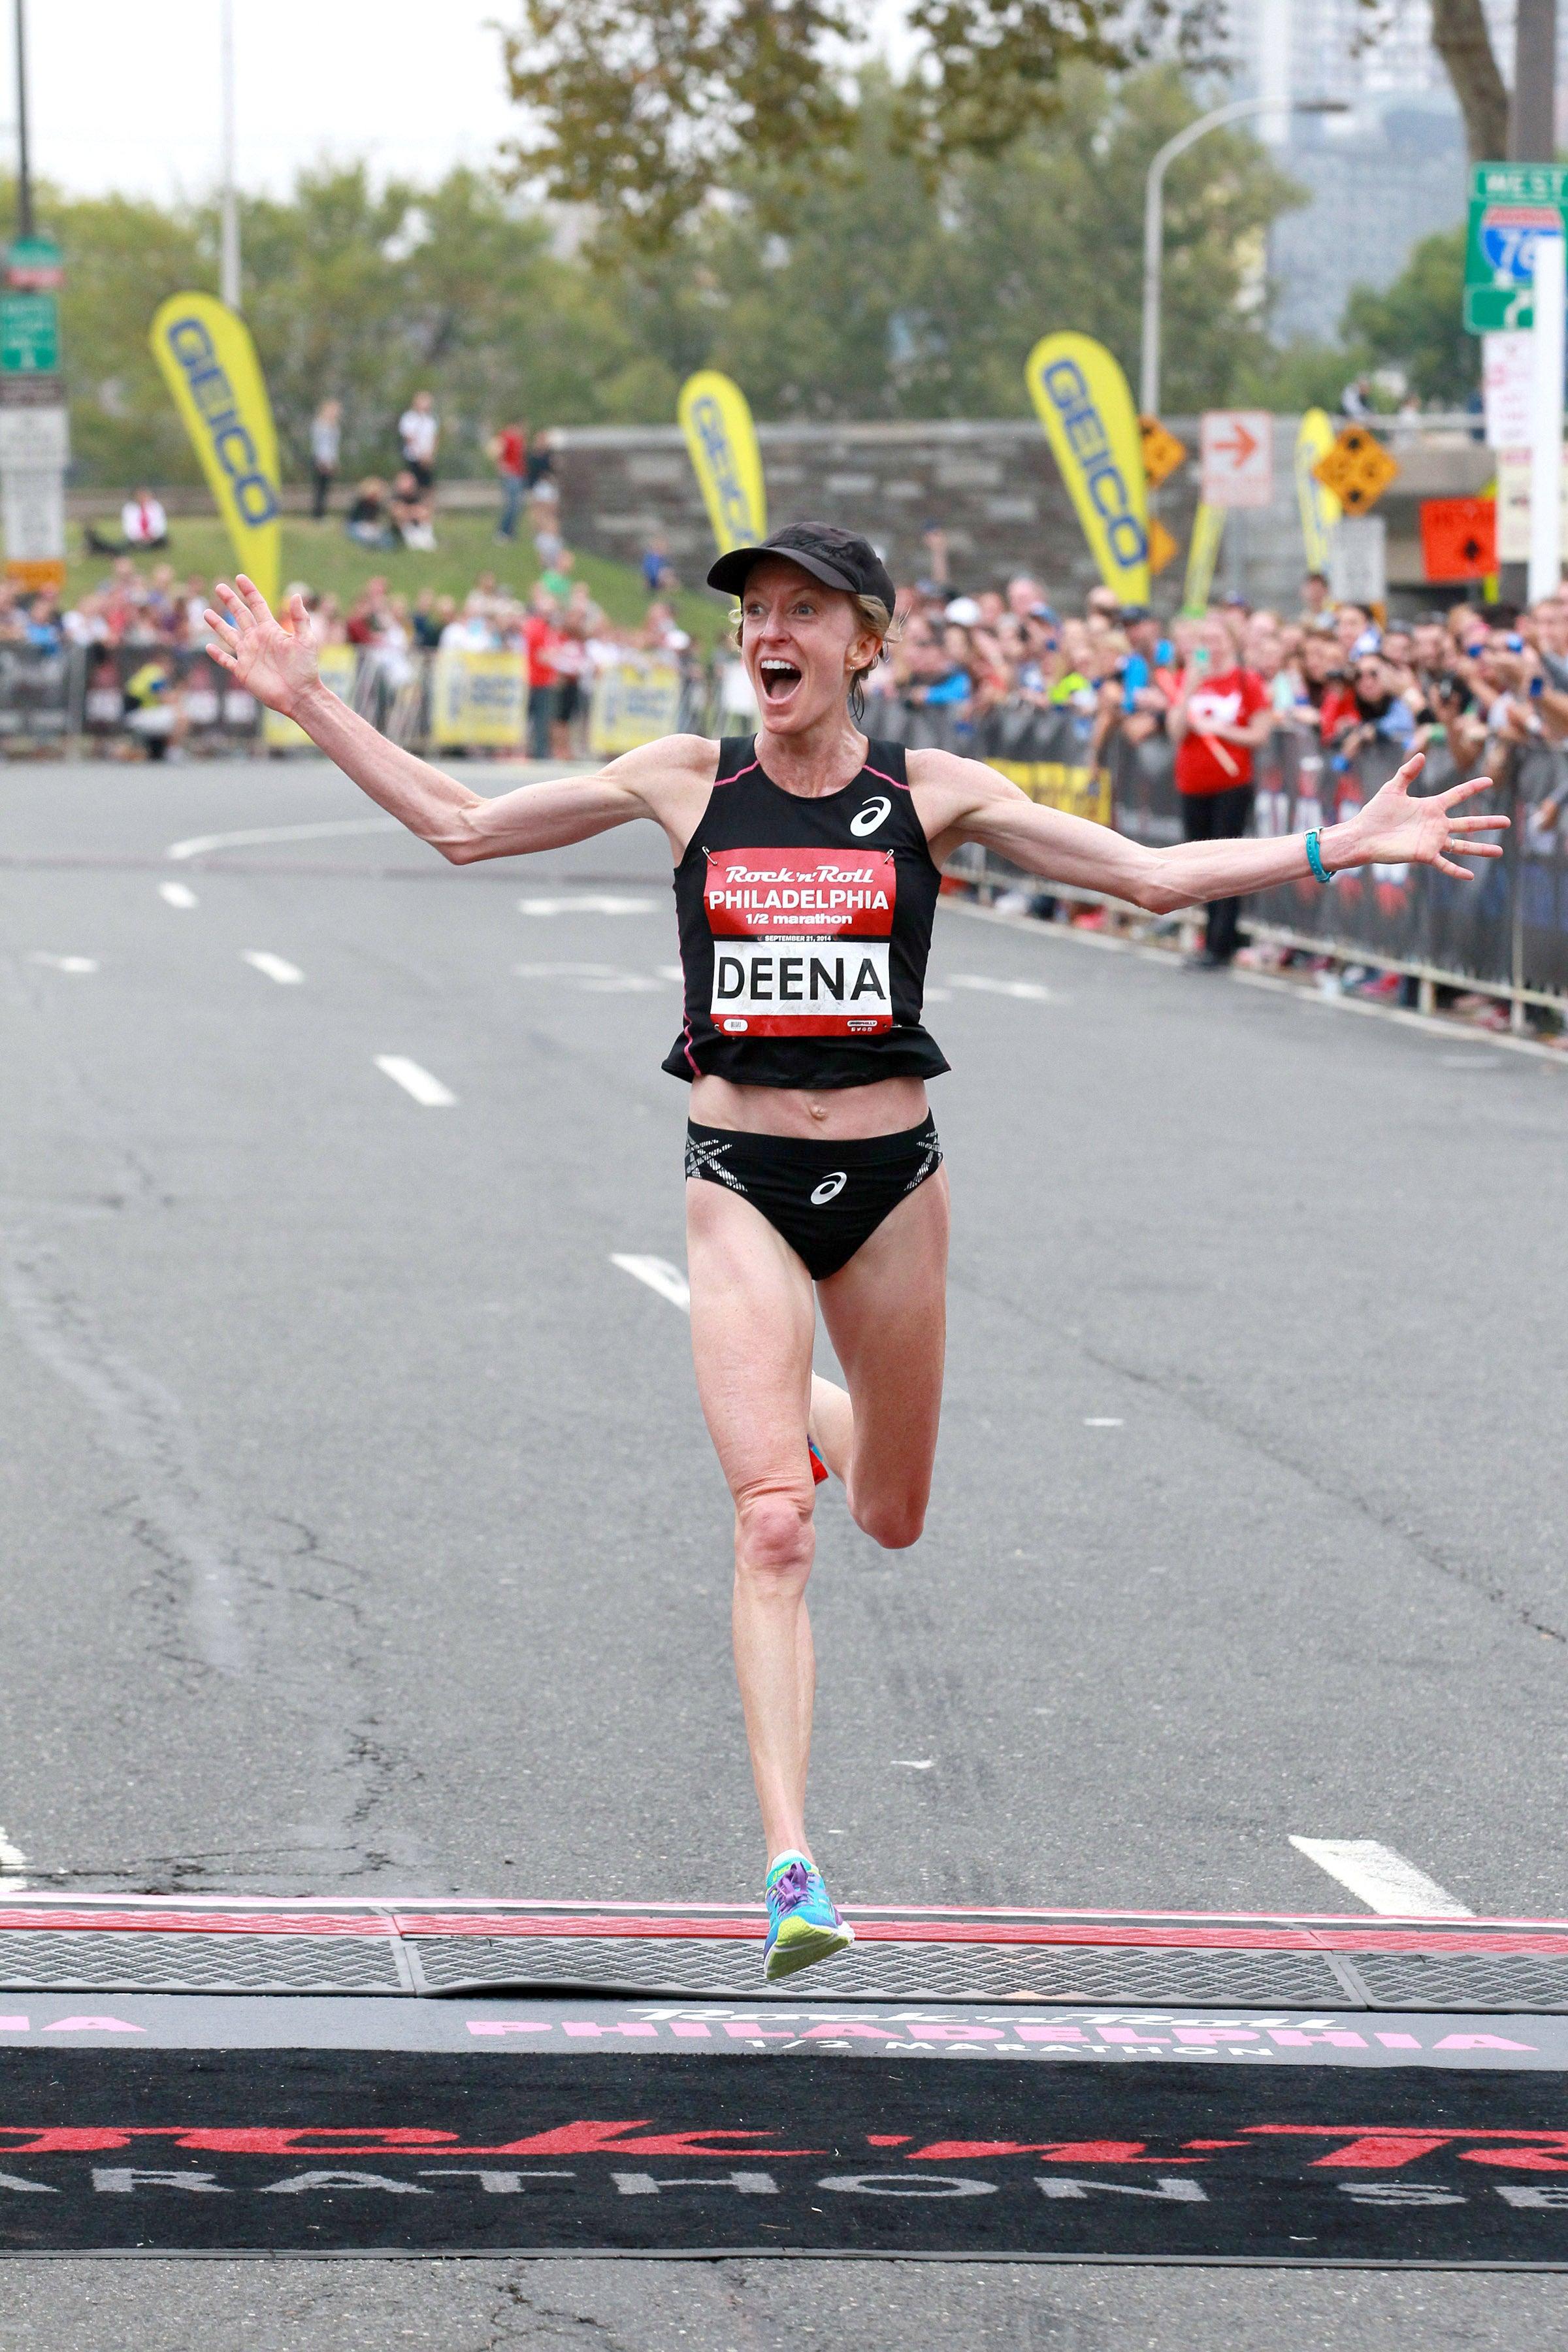 2. Deena (Drossin) Kastor, 2:19:36, 2004 Olympic Bronze Medalist